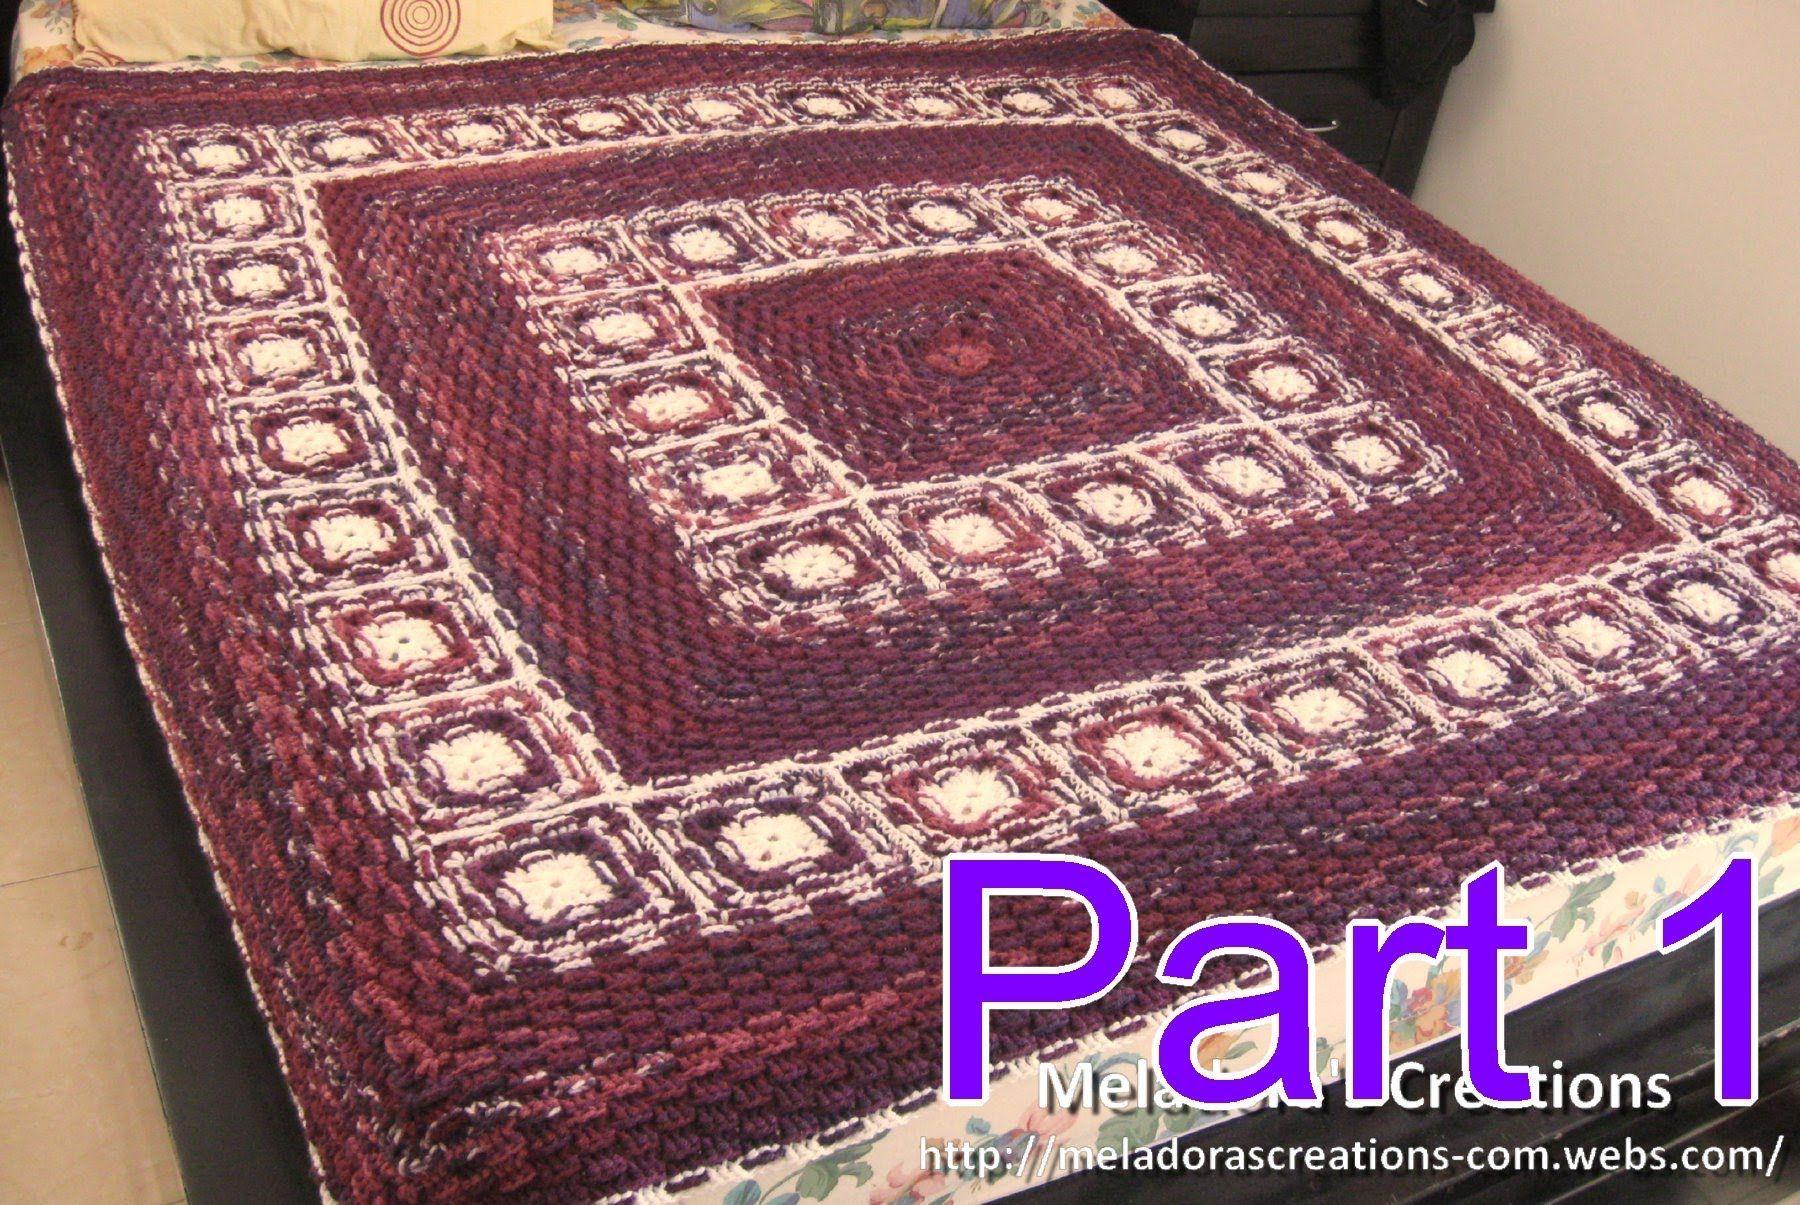 Basket Weave Granny Afghan Pt 1 - Making the Grannies - Crochet ...